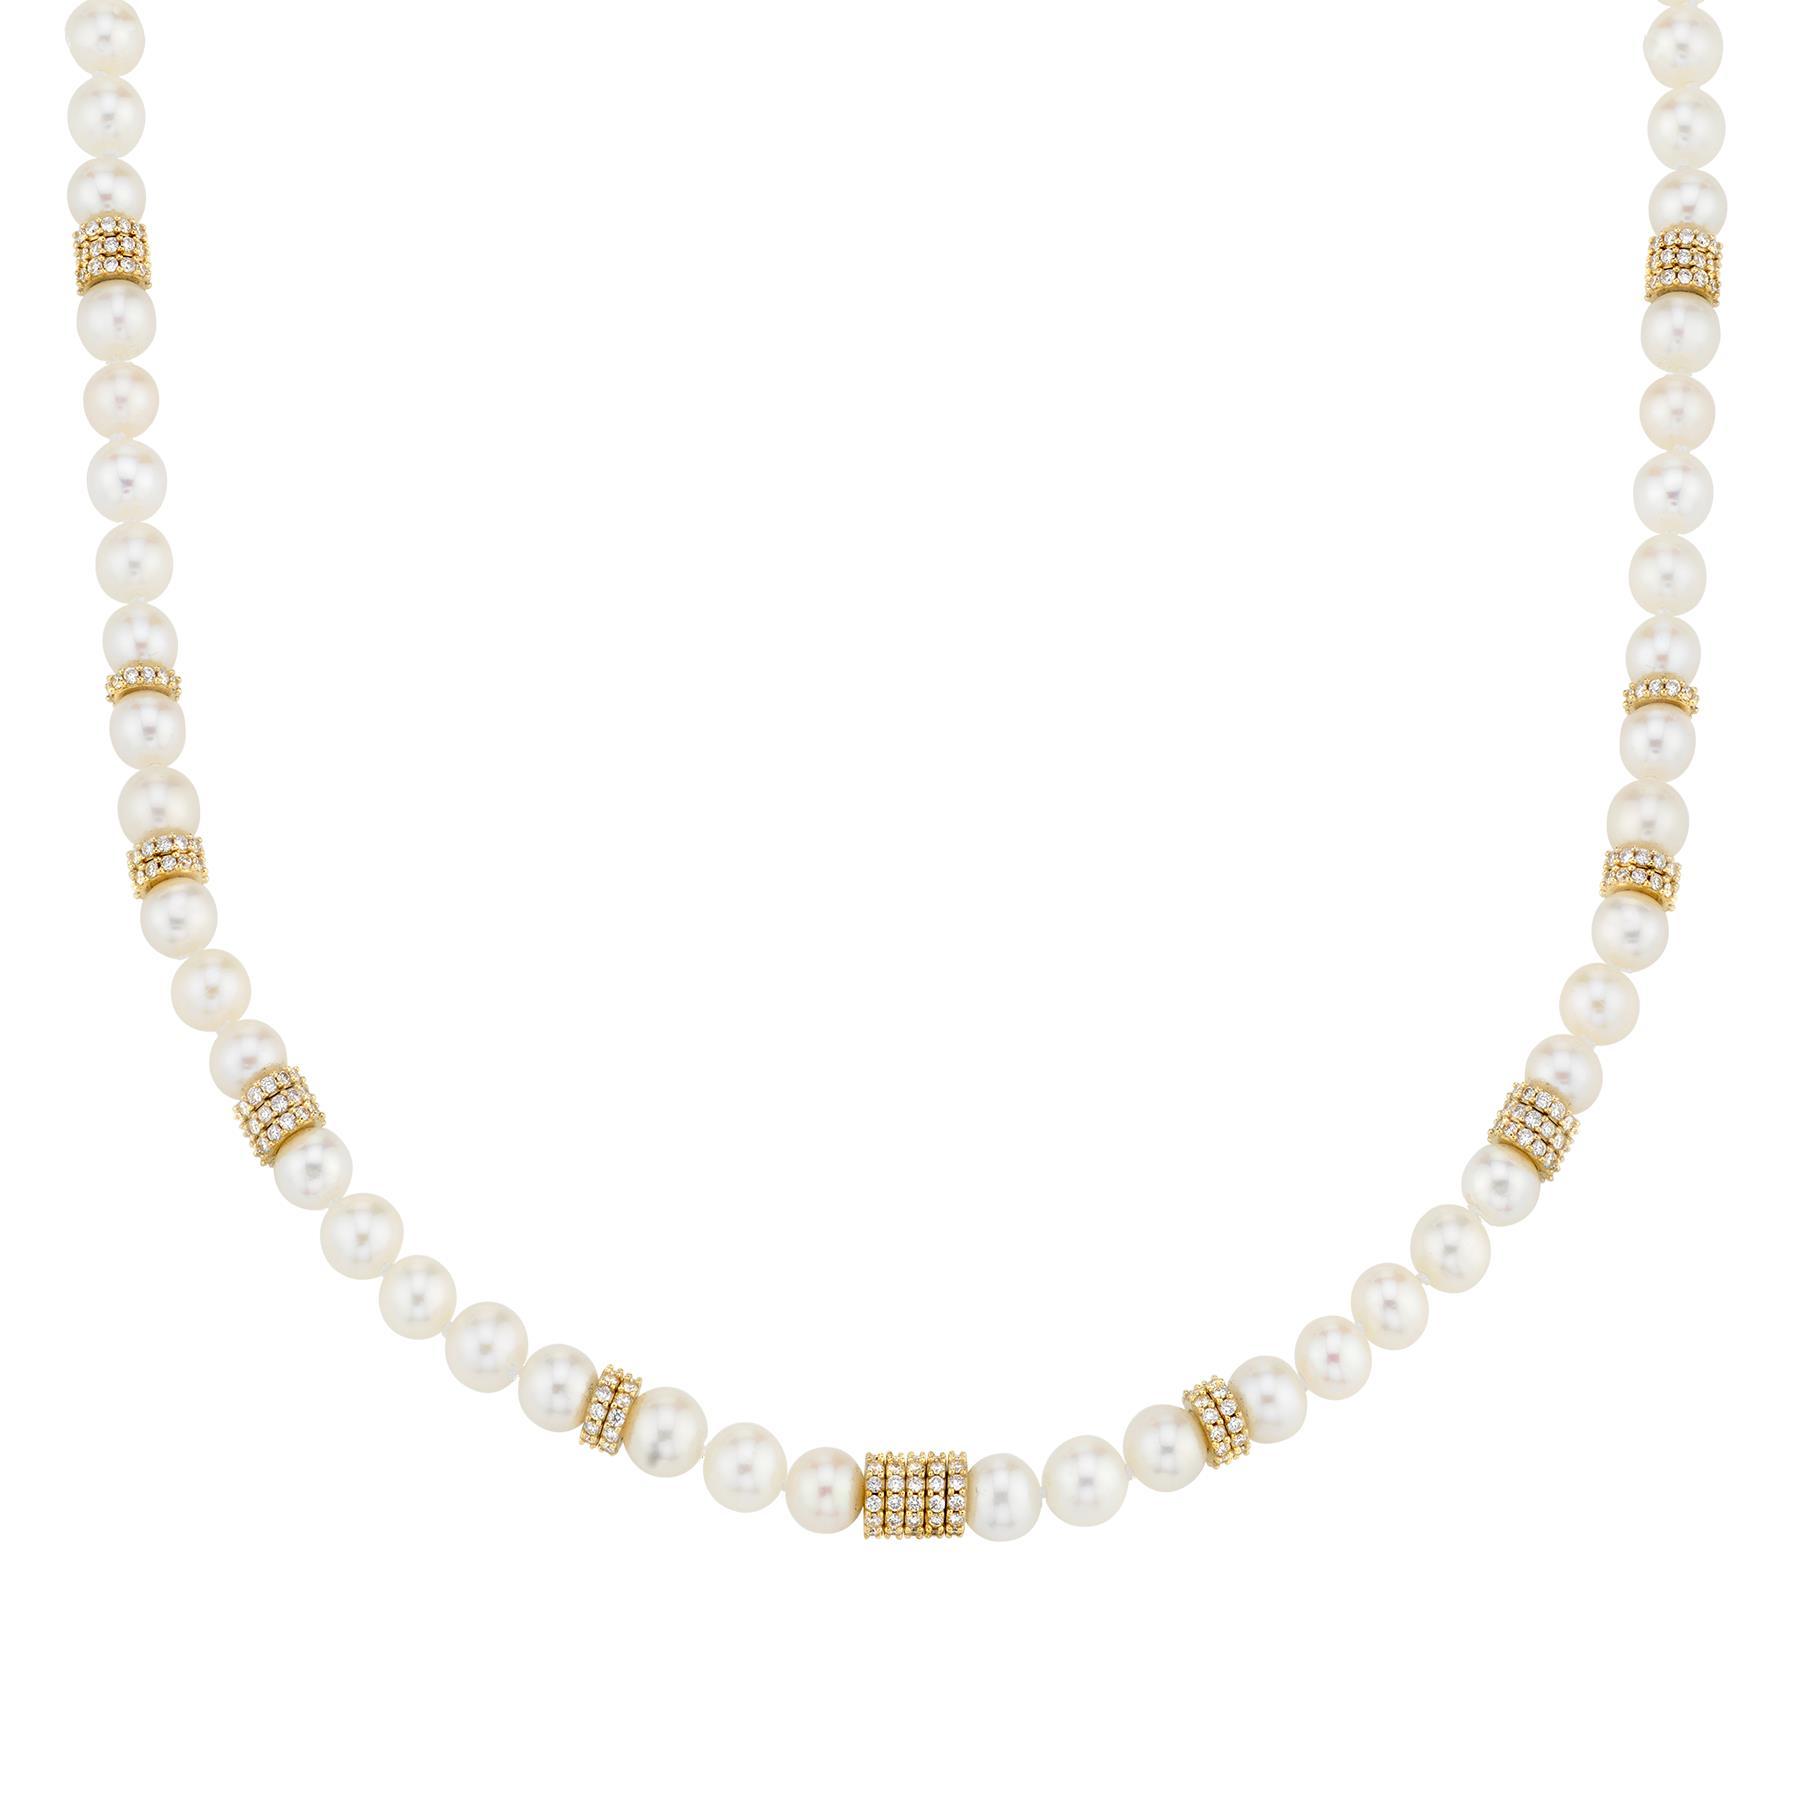 DIAMOND AND PEARL RASA NECKLACE